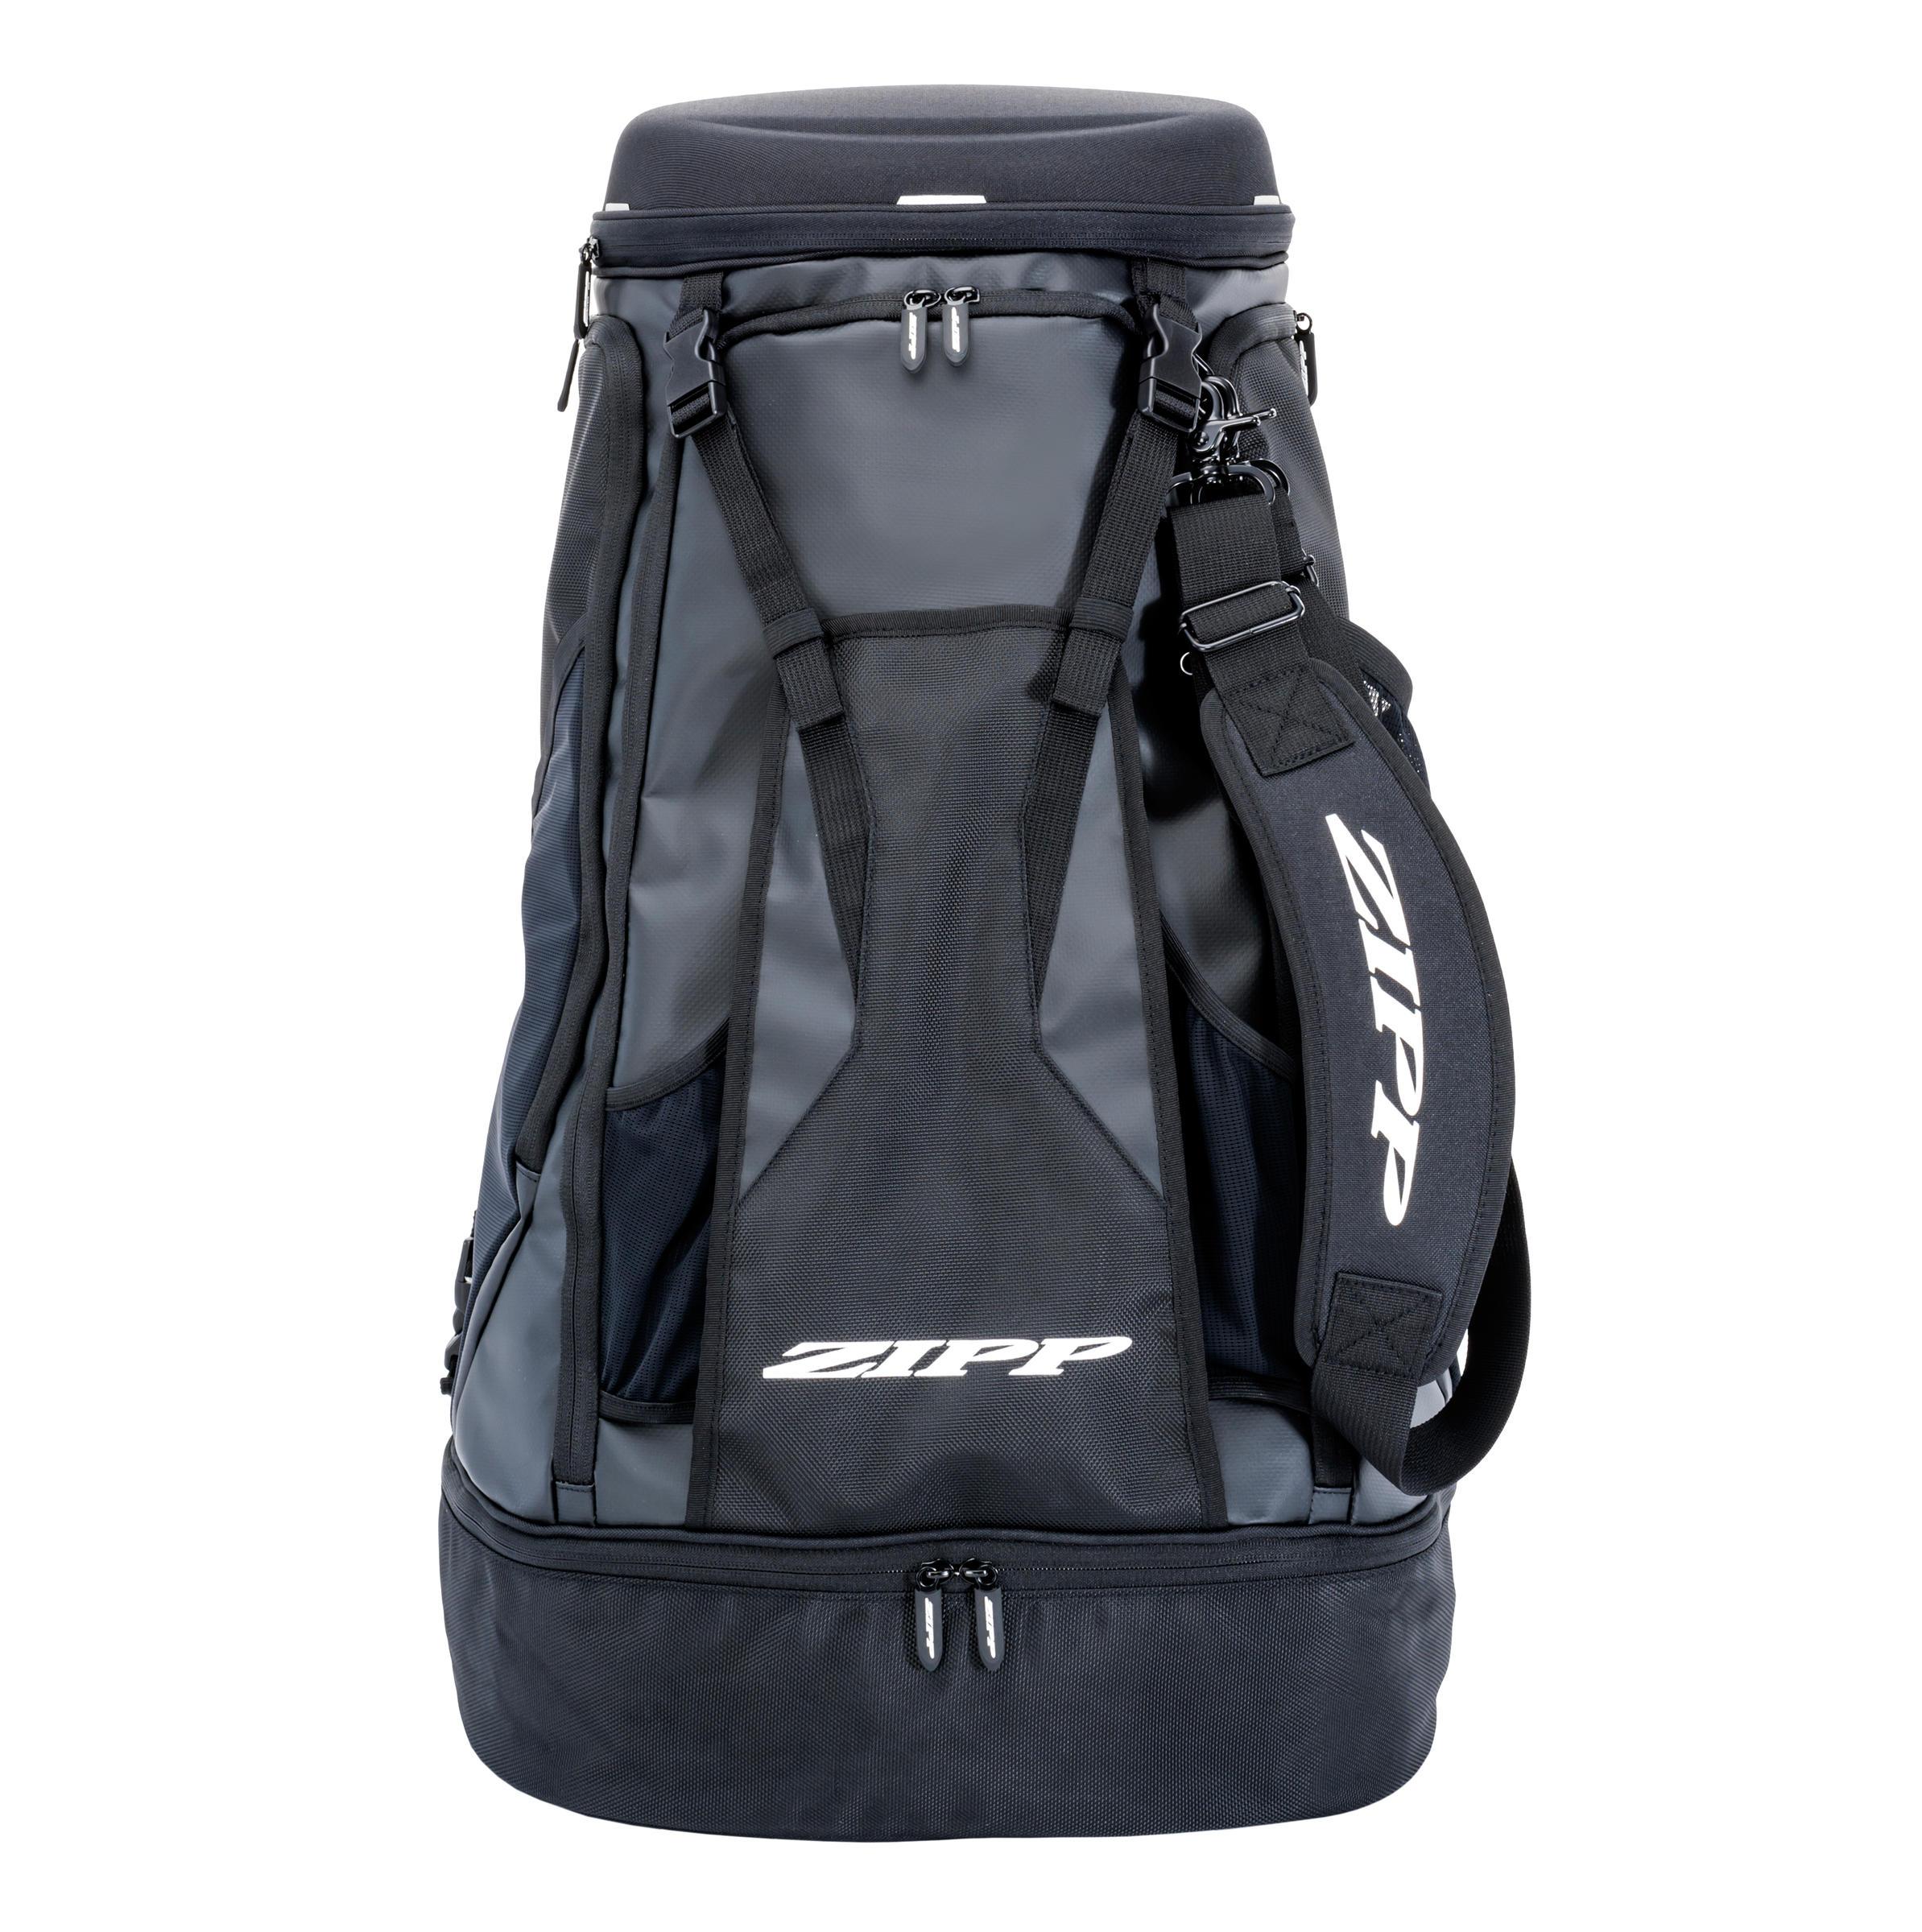 Zipp Transition 1 Gear Bag 2019